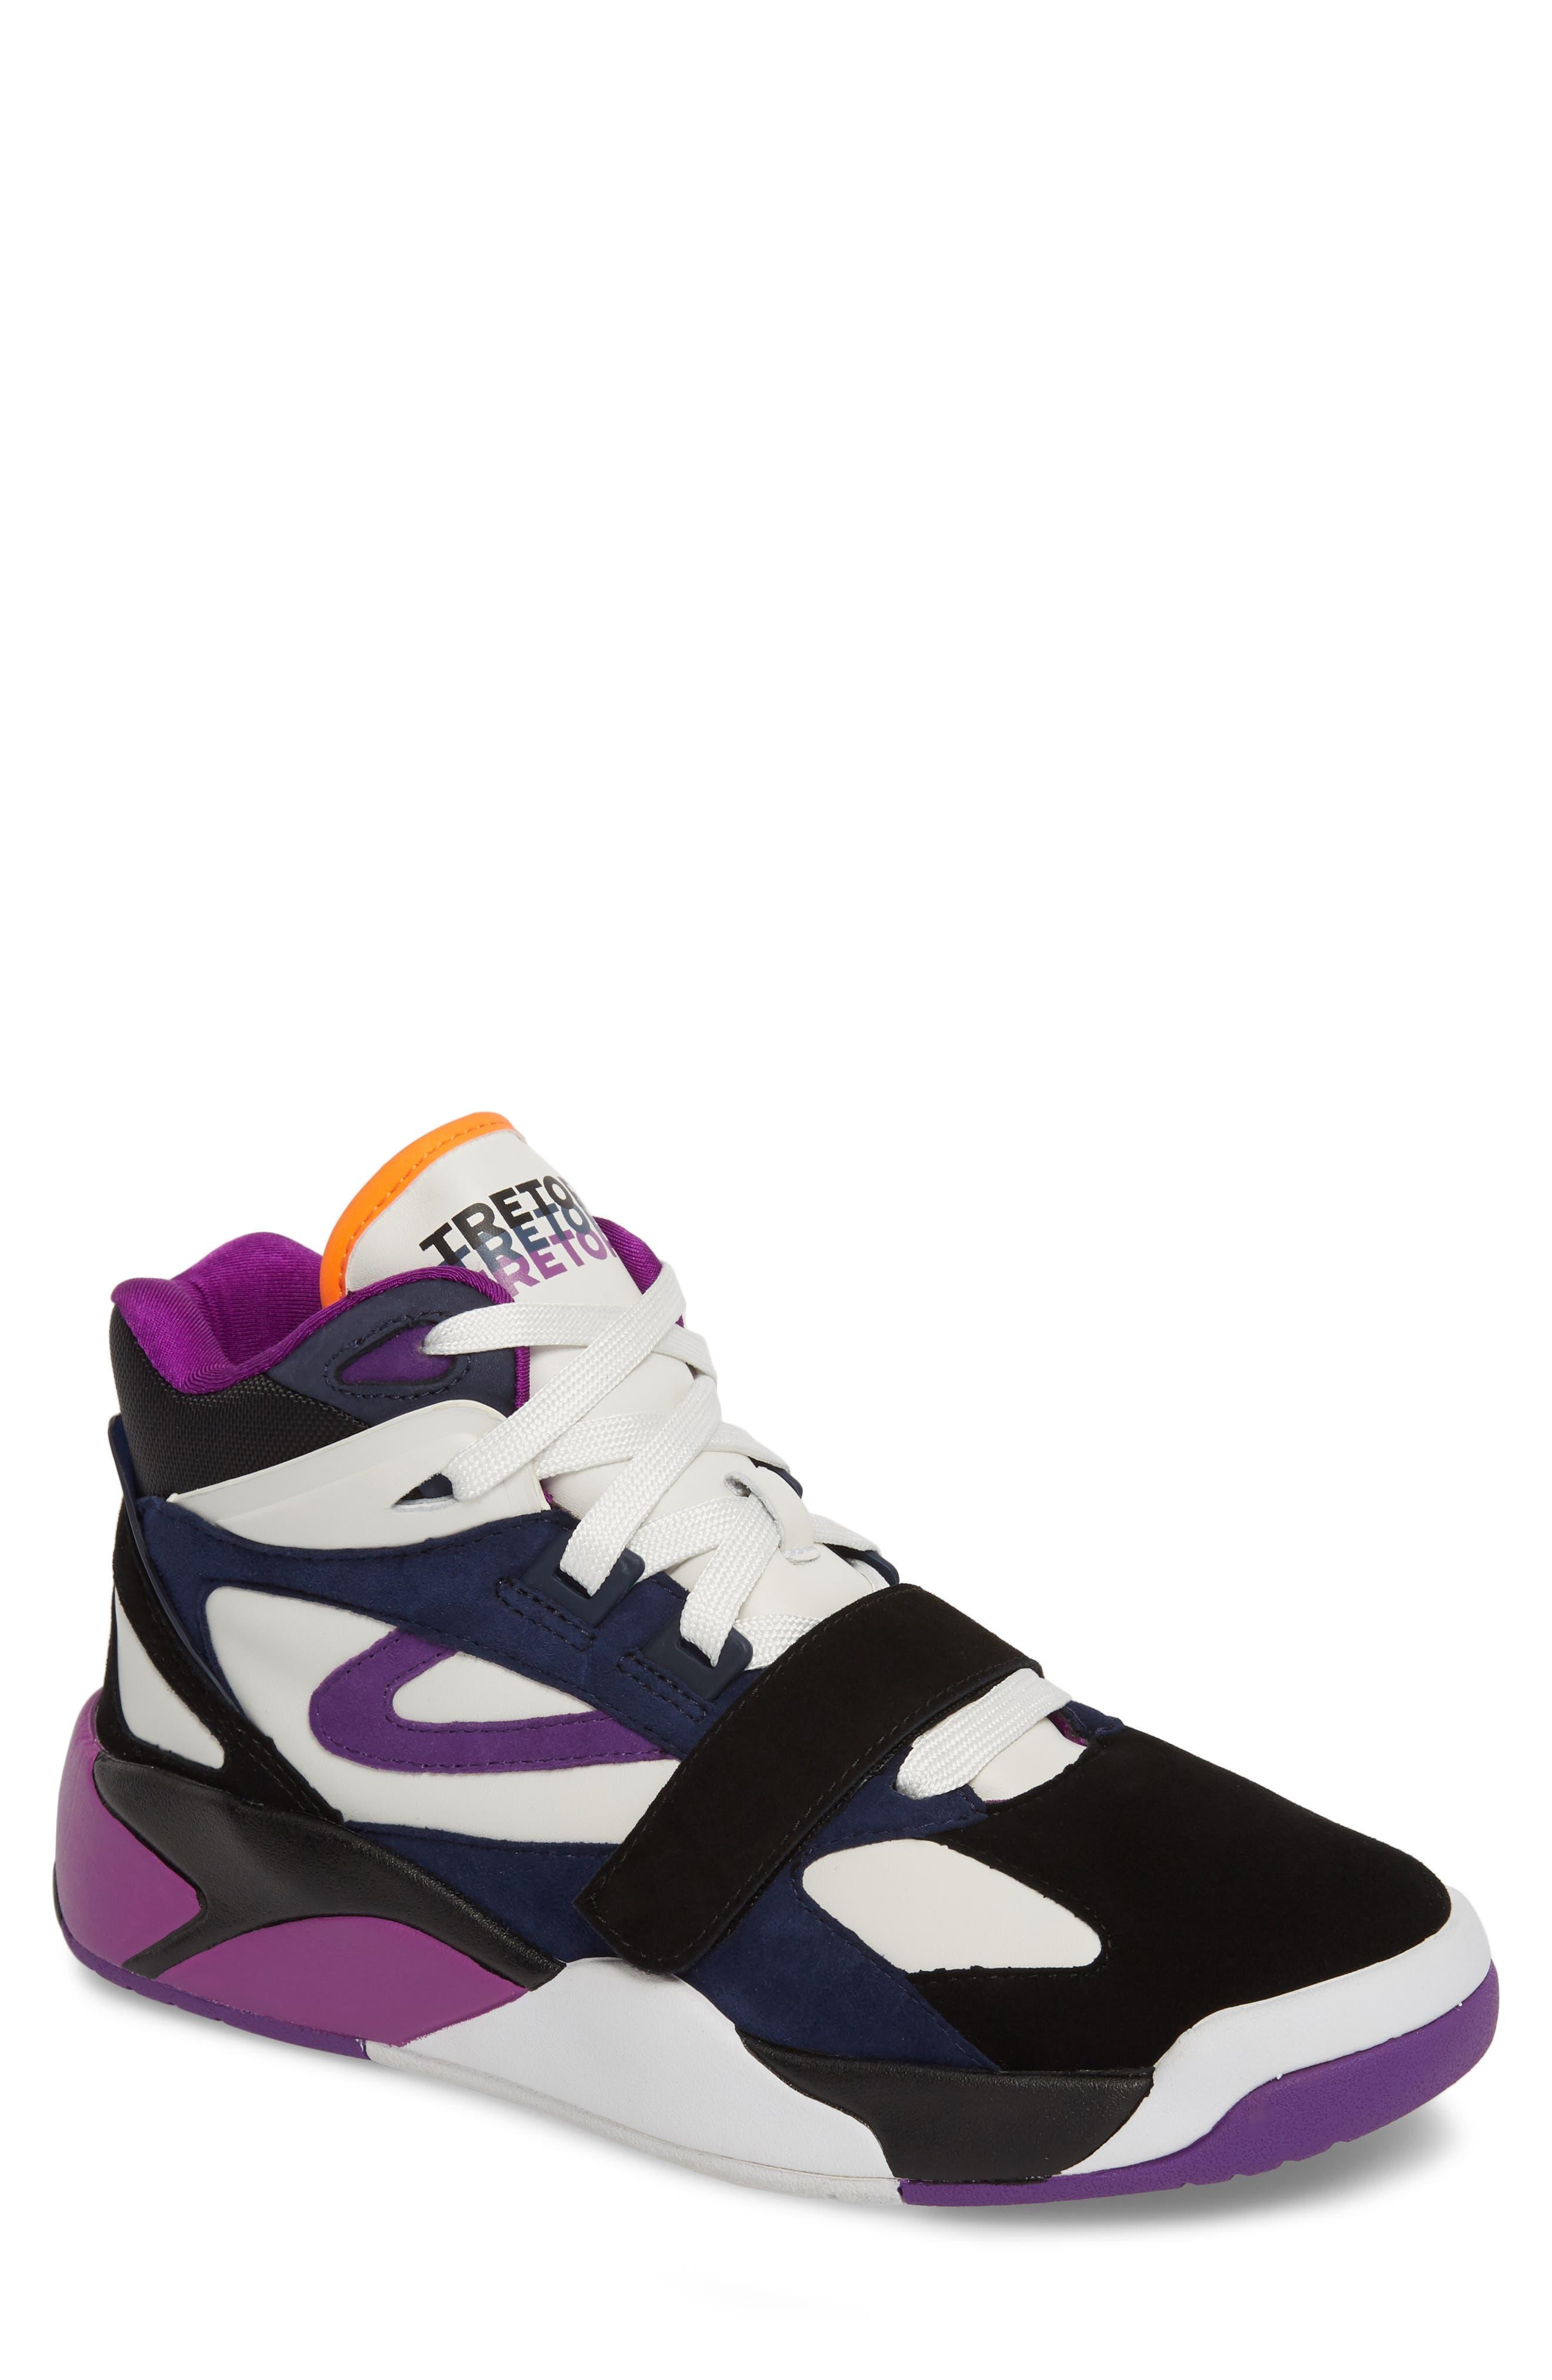 Andre 3000 Bostad 2 High Top Sneaker,                             Main thumbnail 1, color,                             Black/ White/ Purple